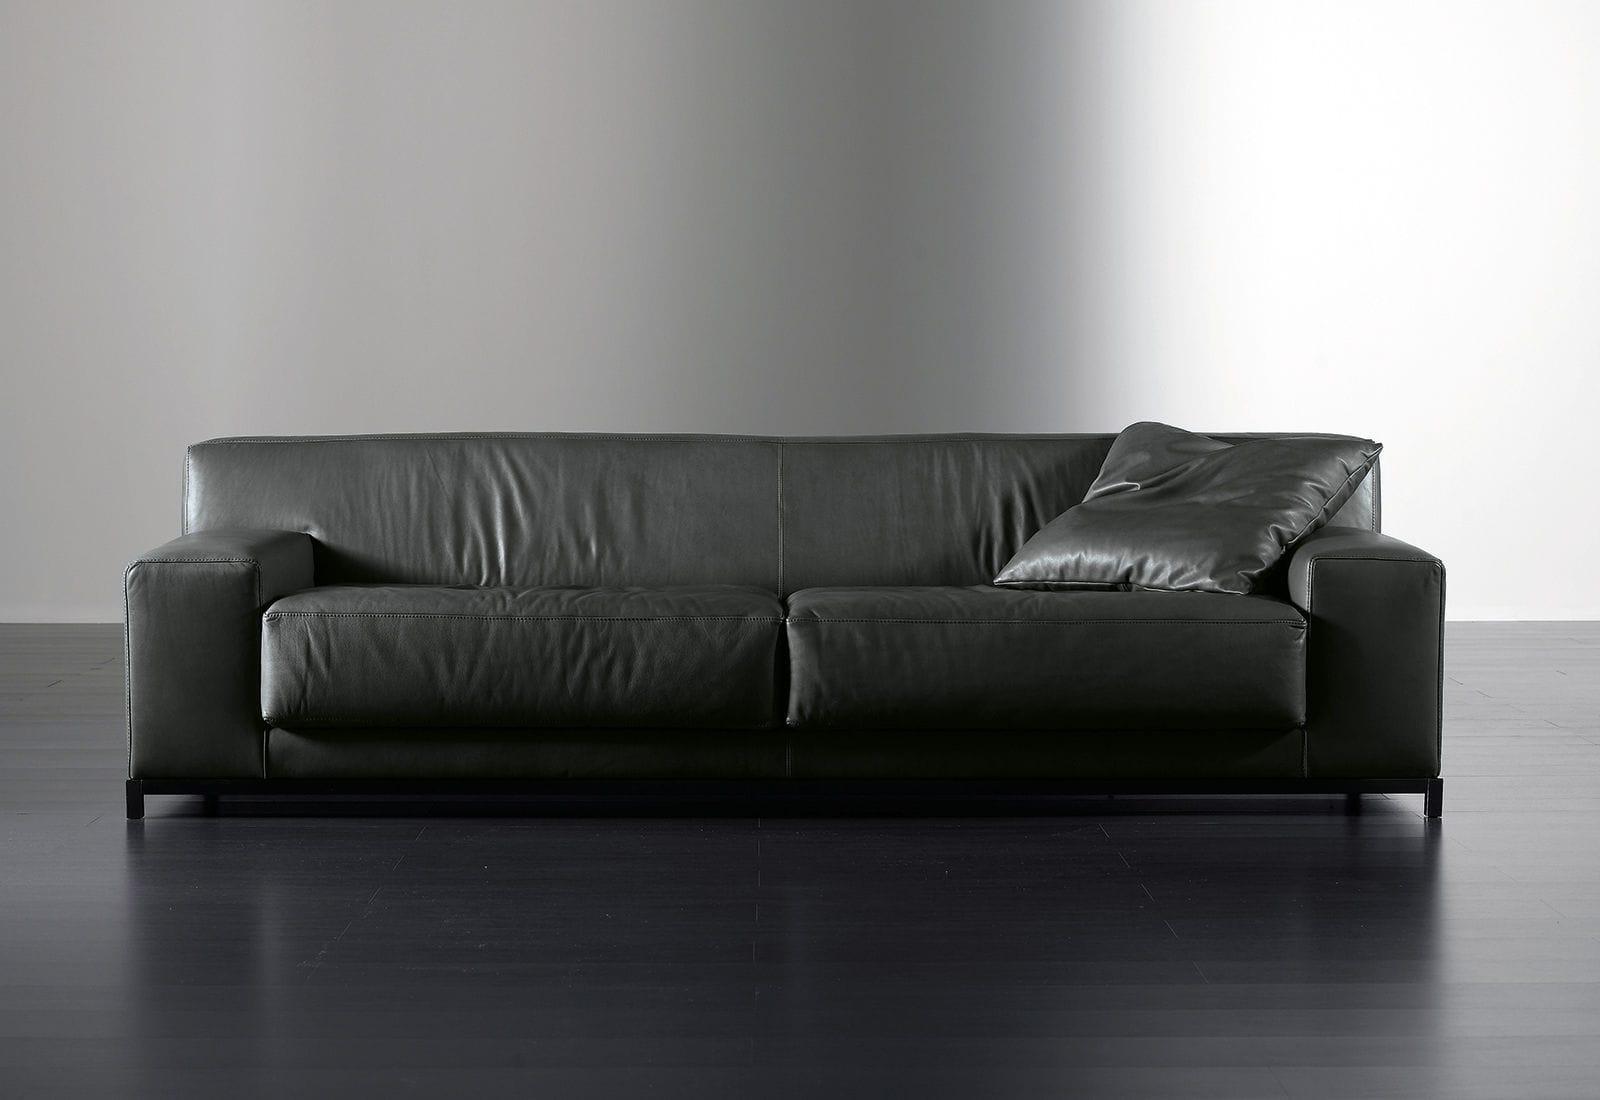 Divano Nero Moderno : Divano moderno in pelle posti nero frieman meridiani